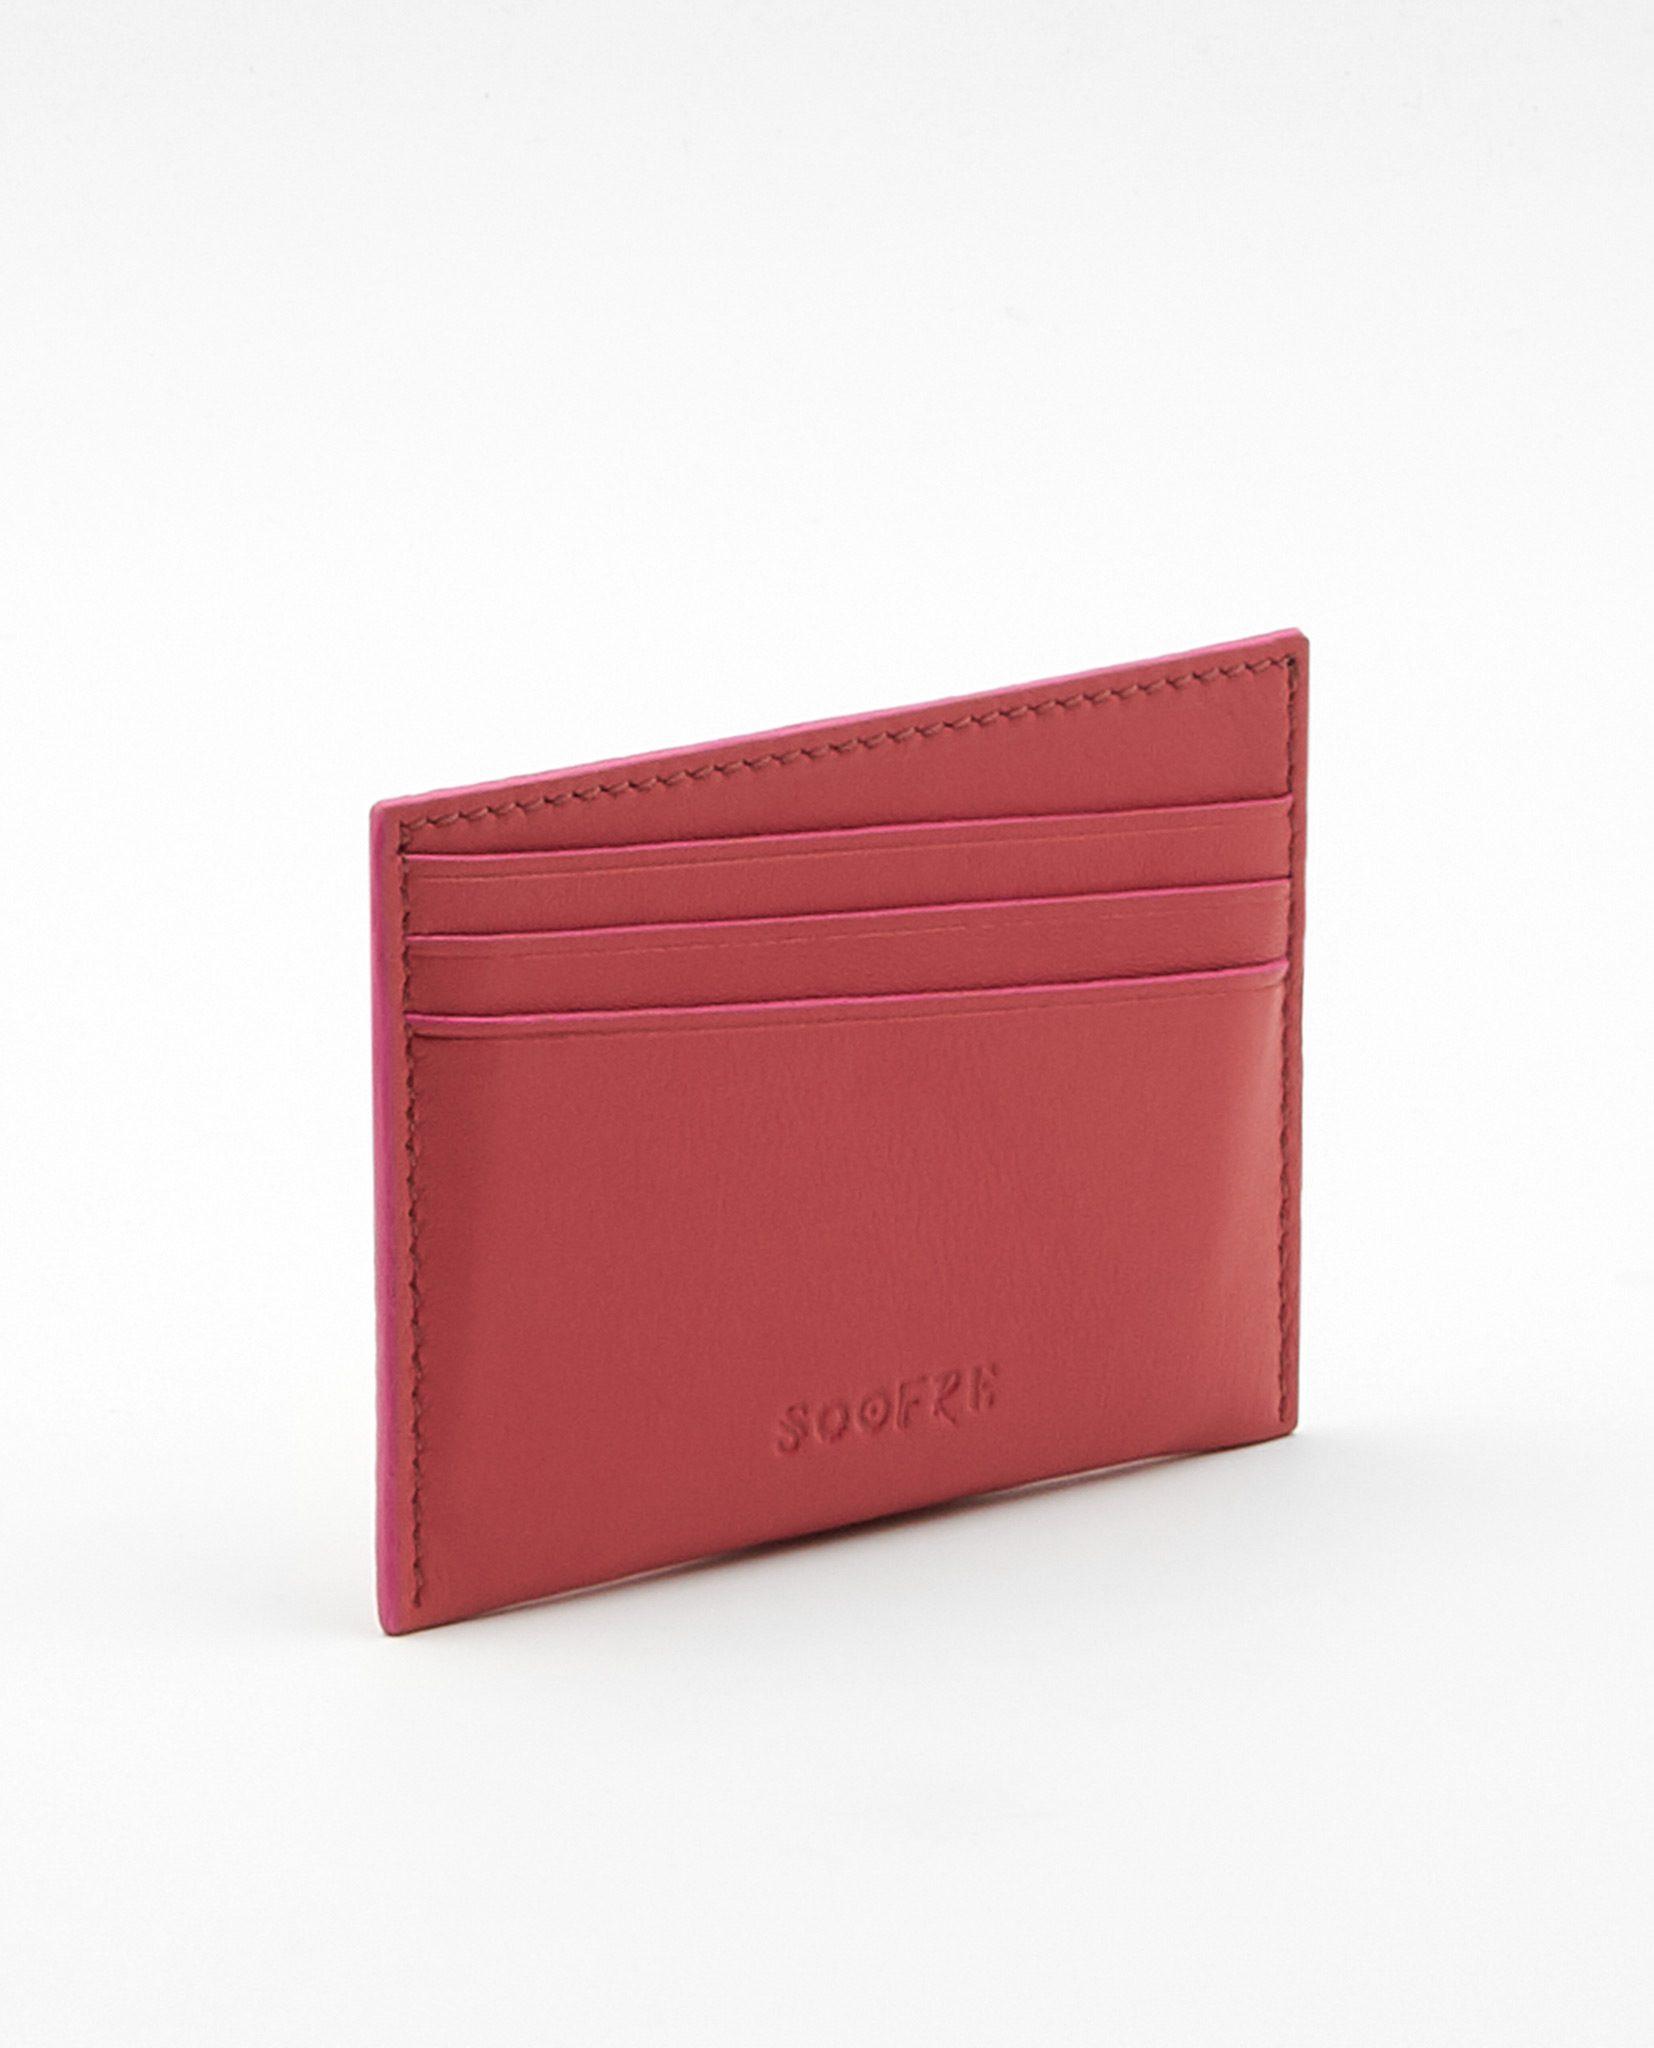 Soofre_Card-Holder_Coral-Fuchsia_1